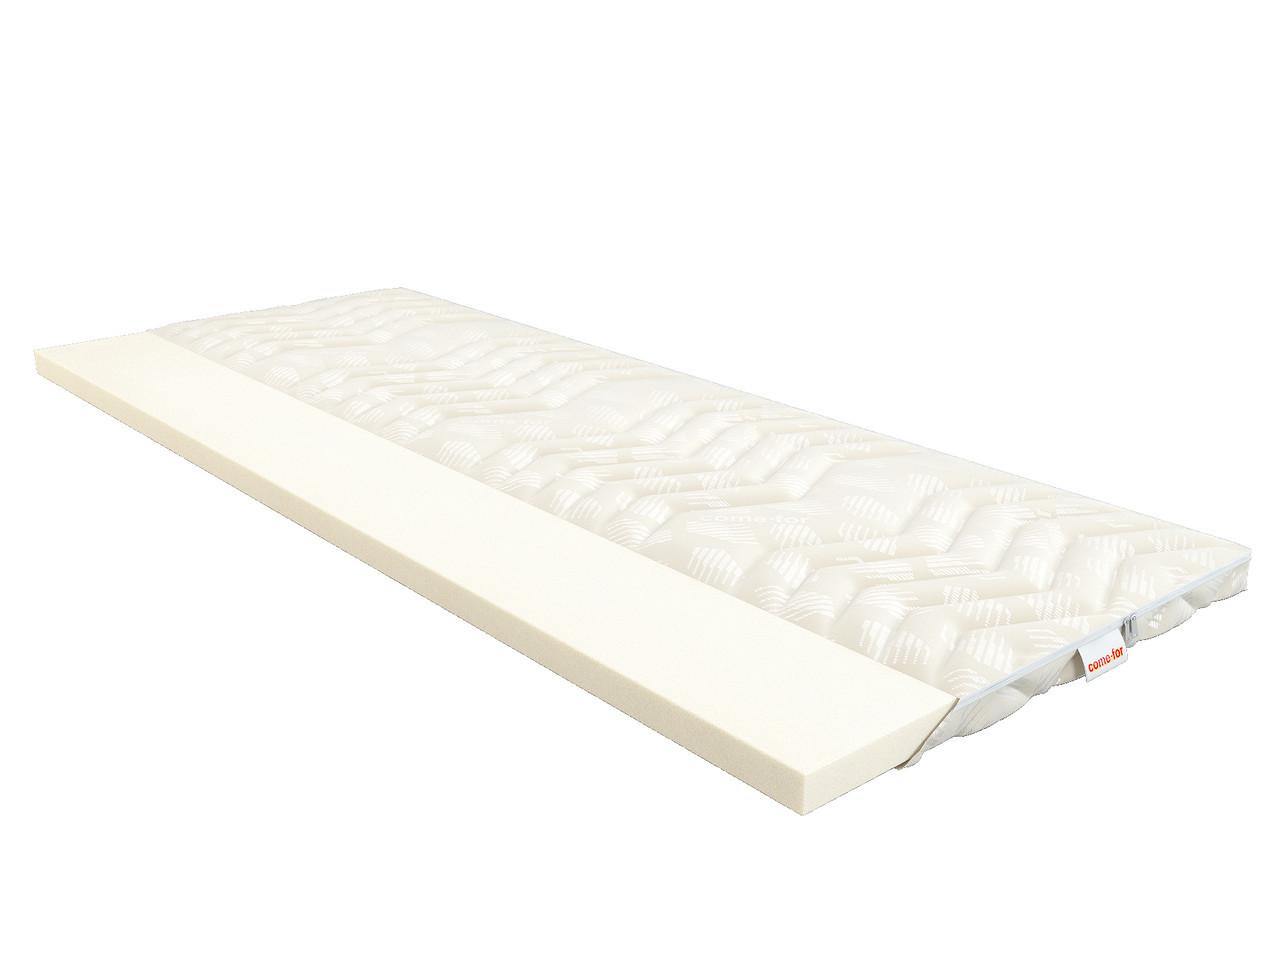 Тонкий матрас для диванов(Футон) Спайс актуальная цена!!! 115*180